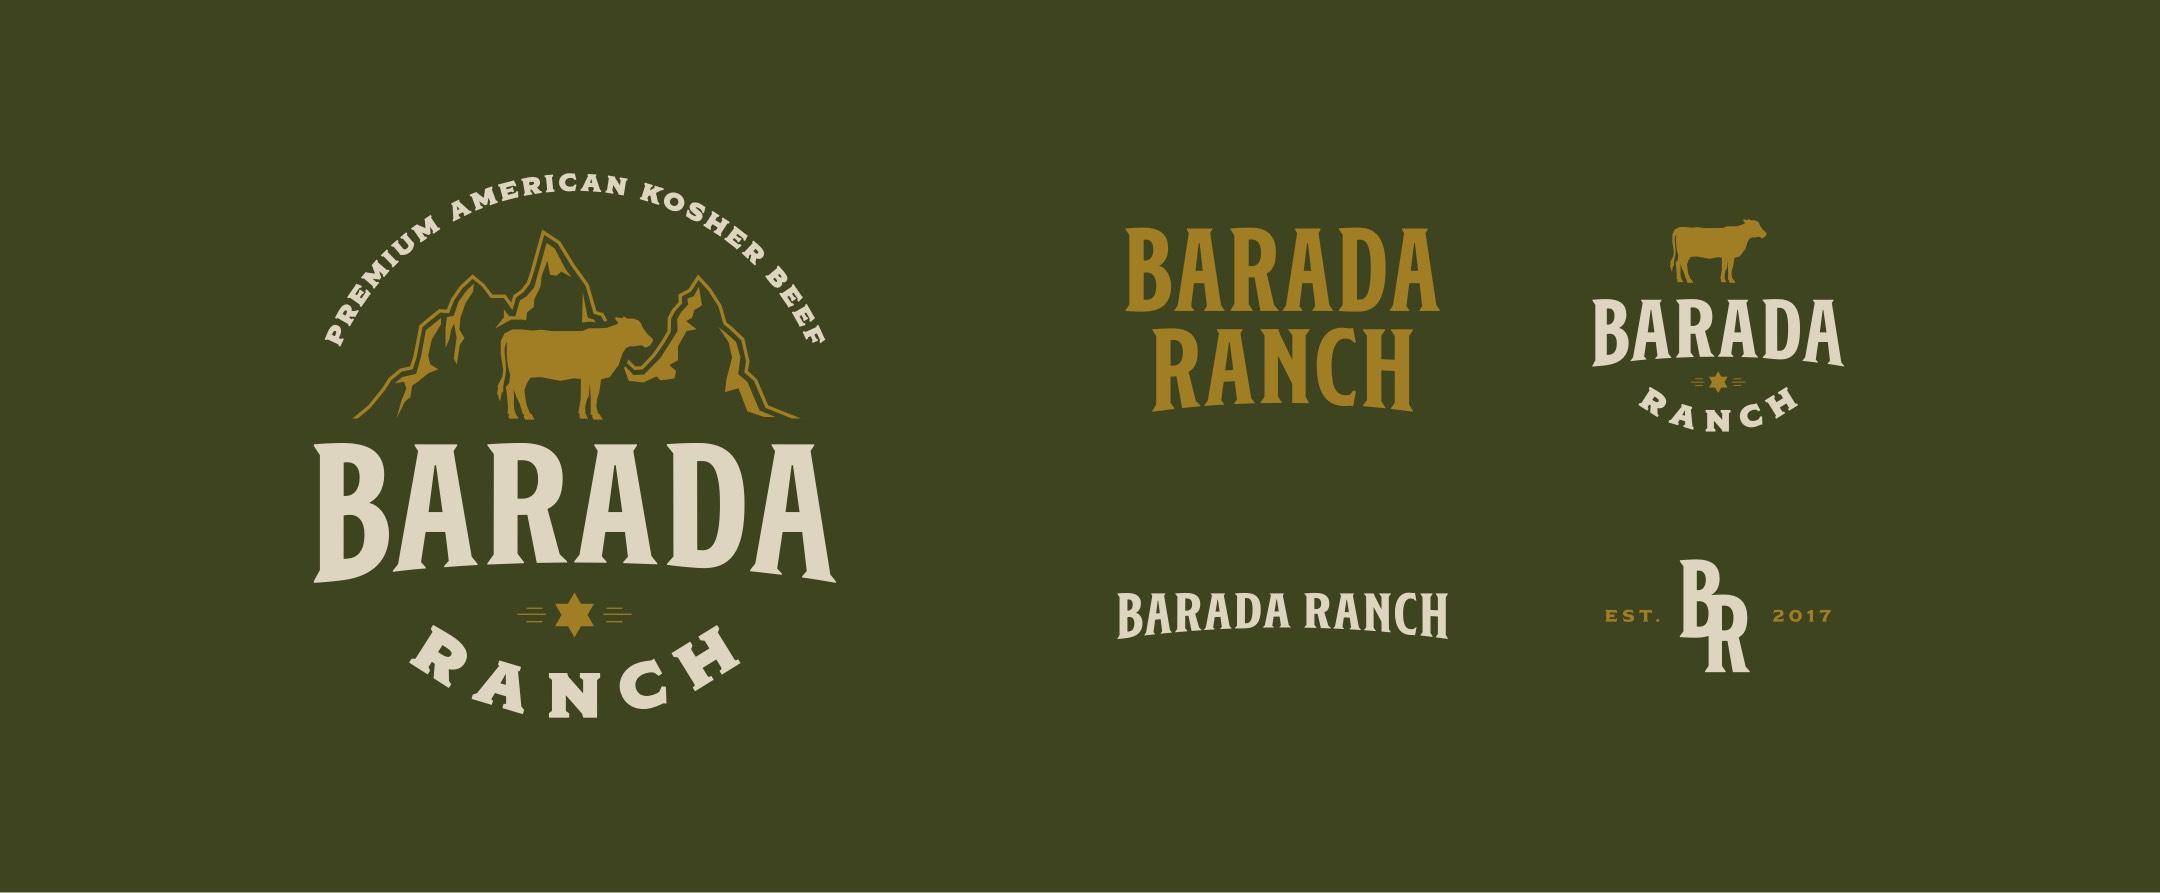 barada ranch logos